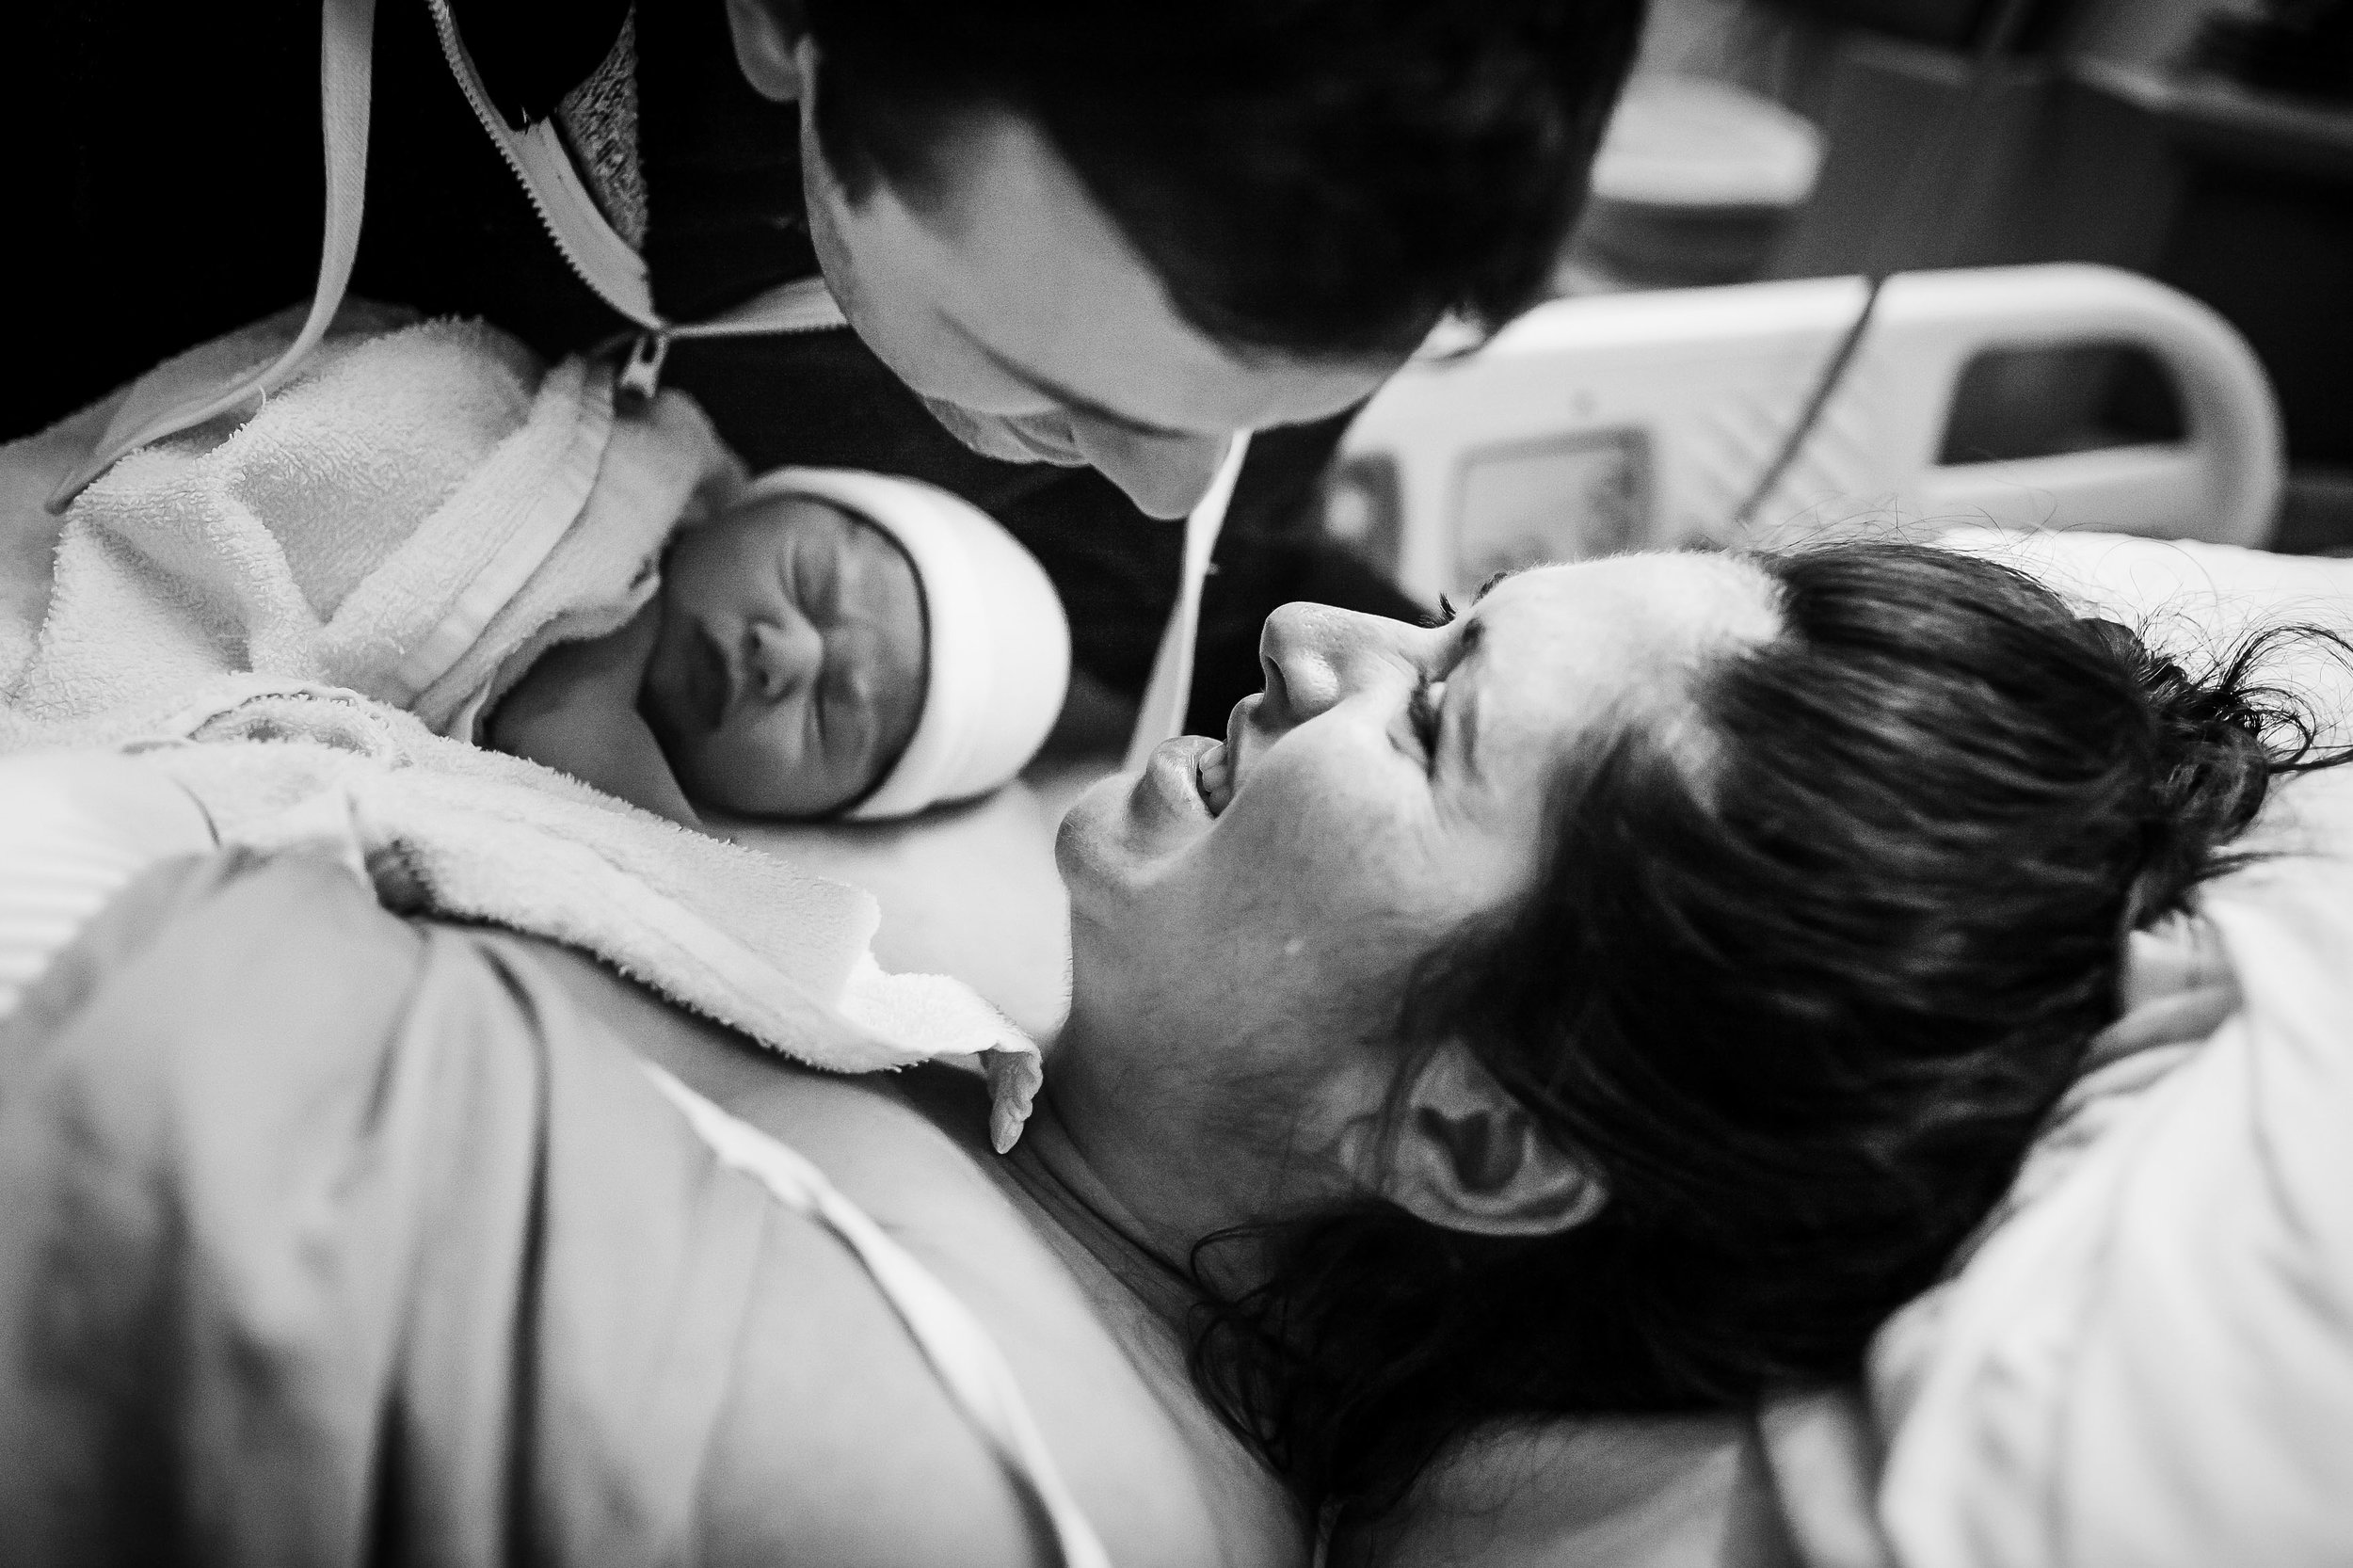 Amanda-birth_126-edit-2.jpg